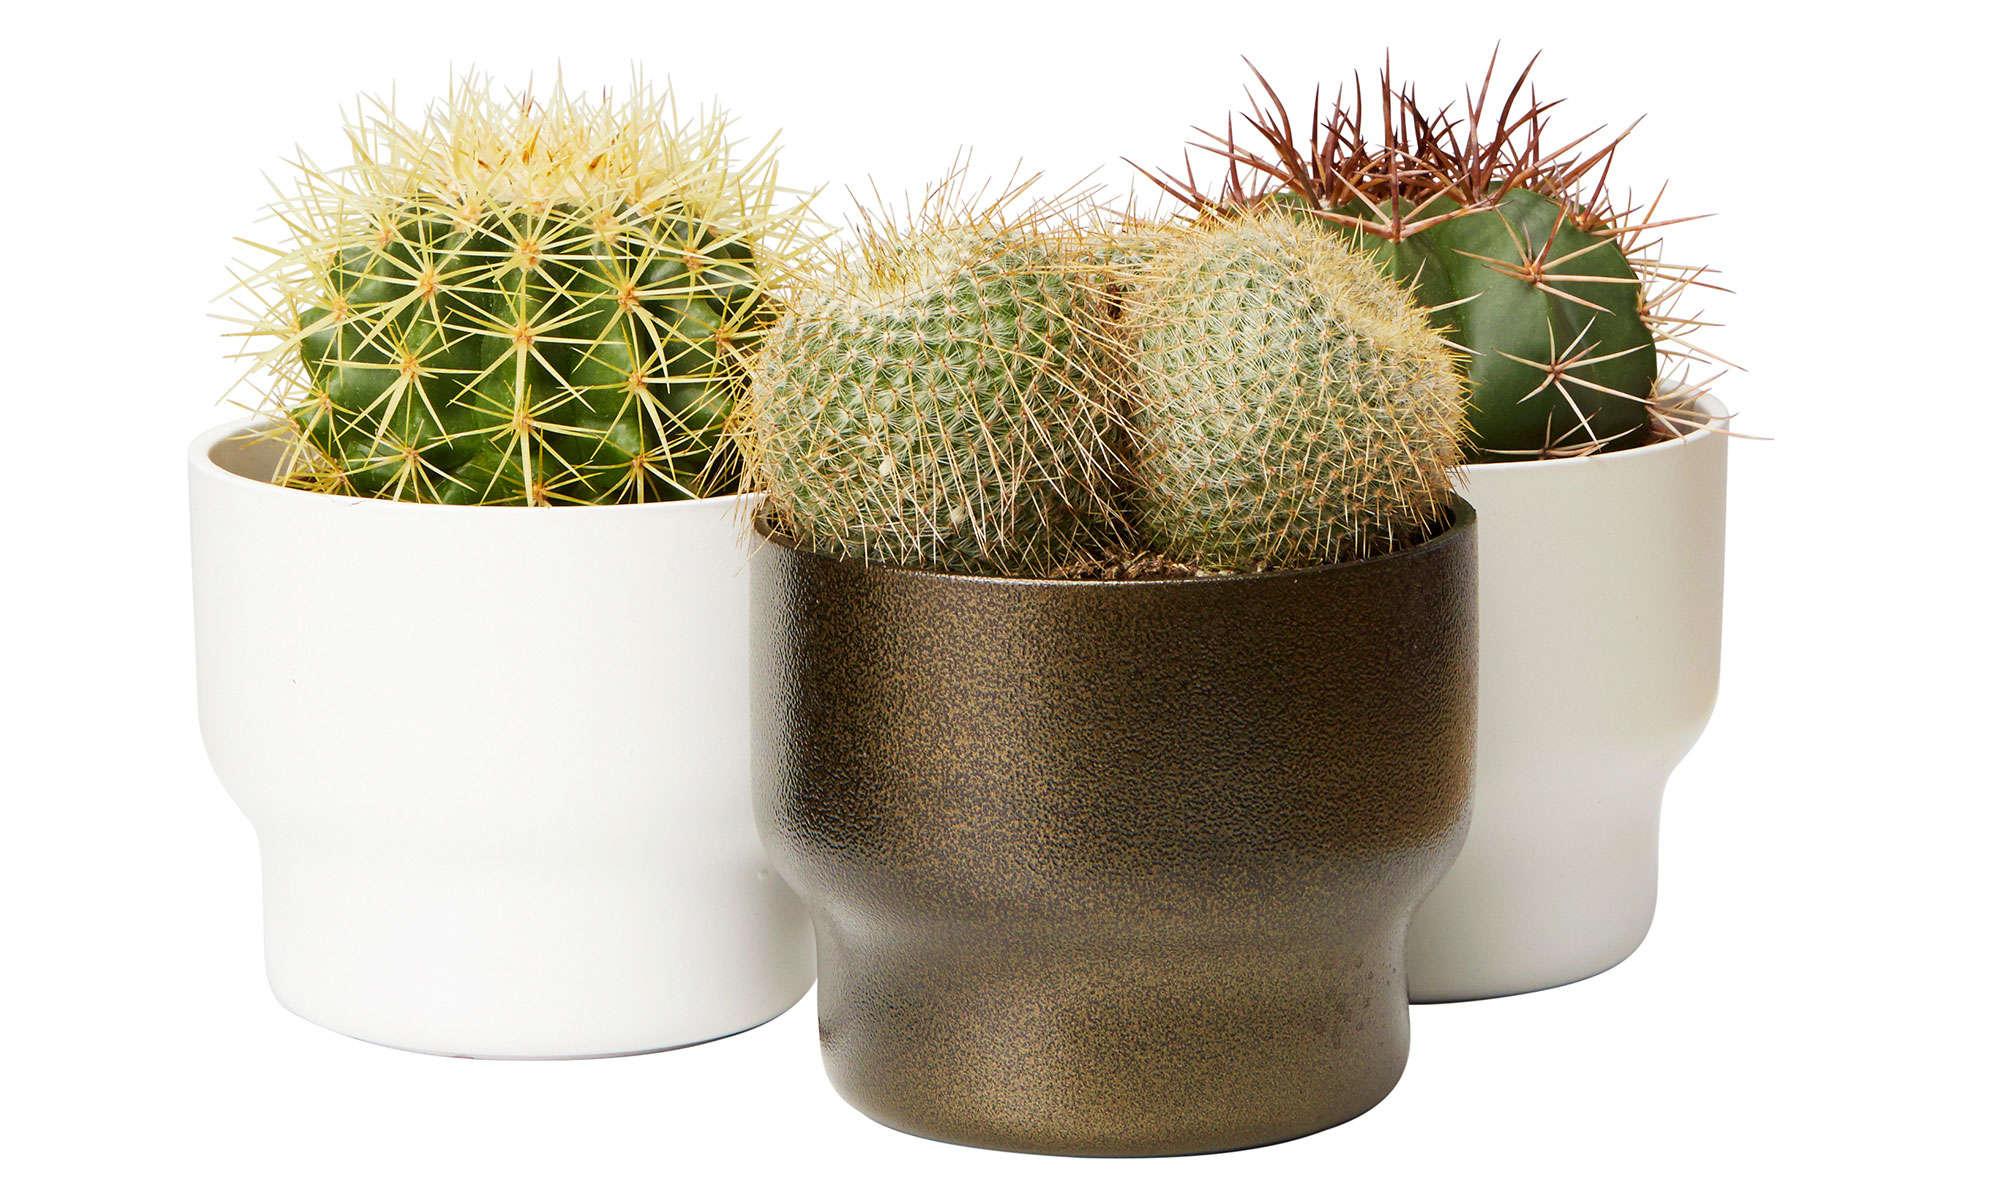 kaktus-hemmafix-plantagen